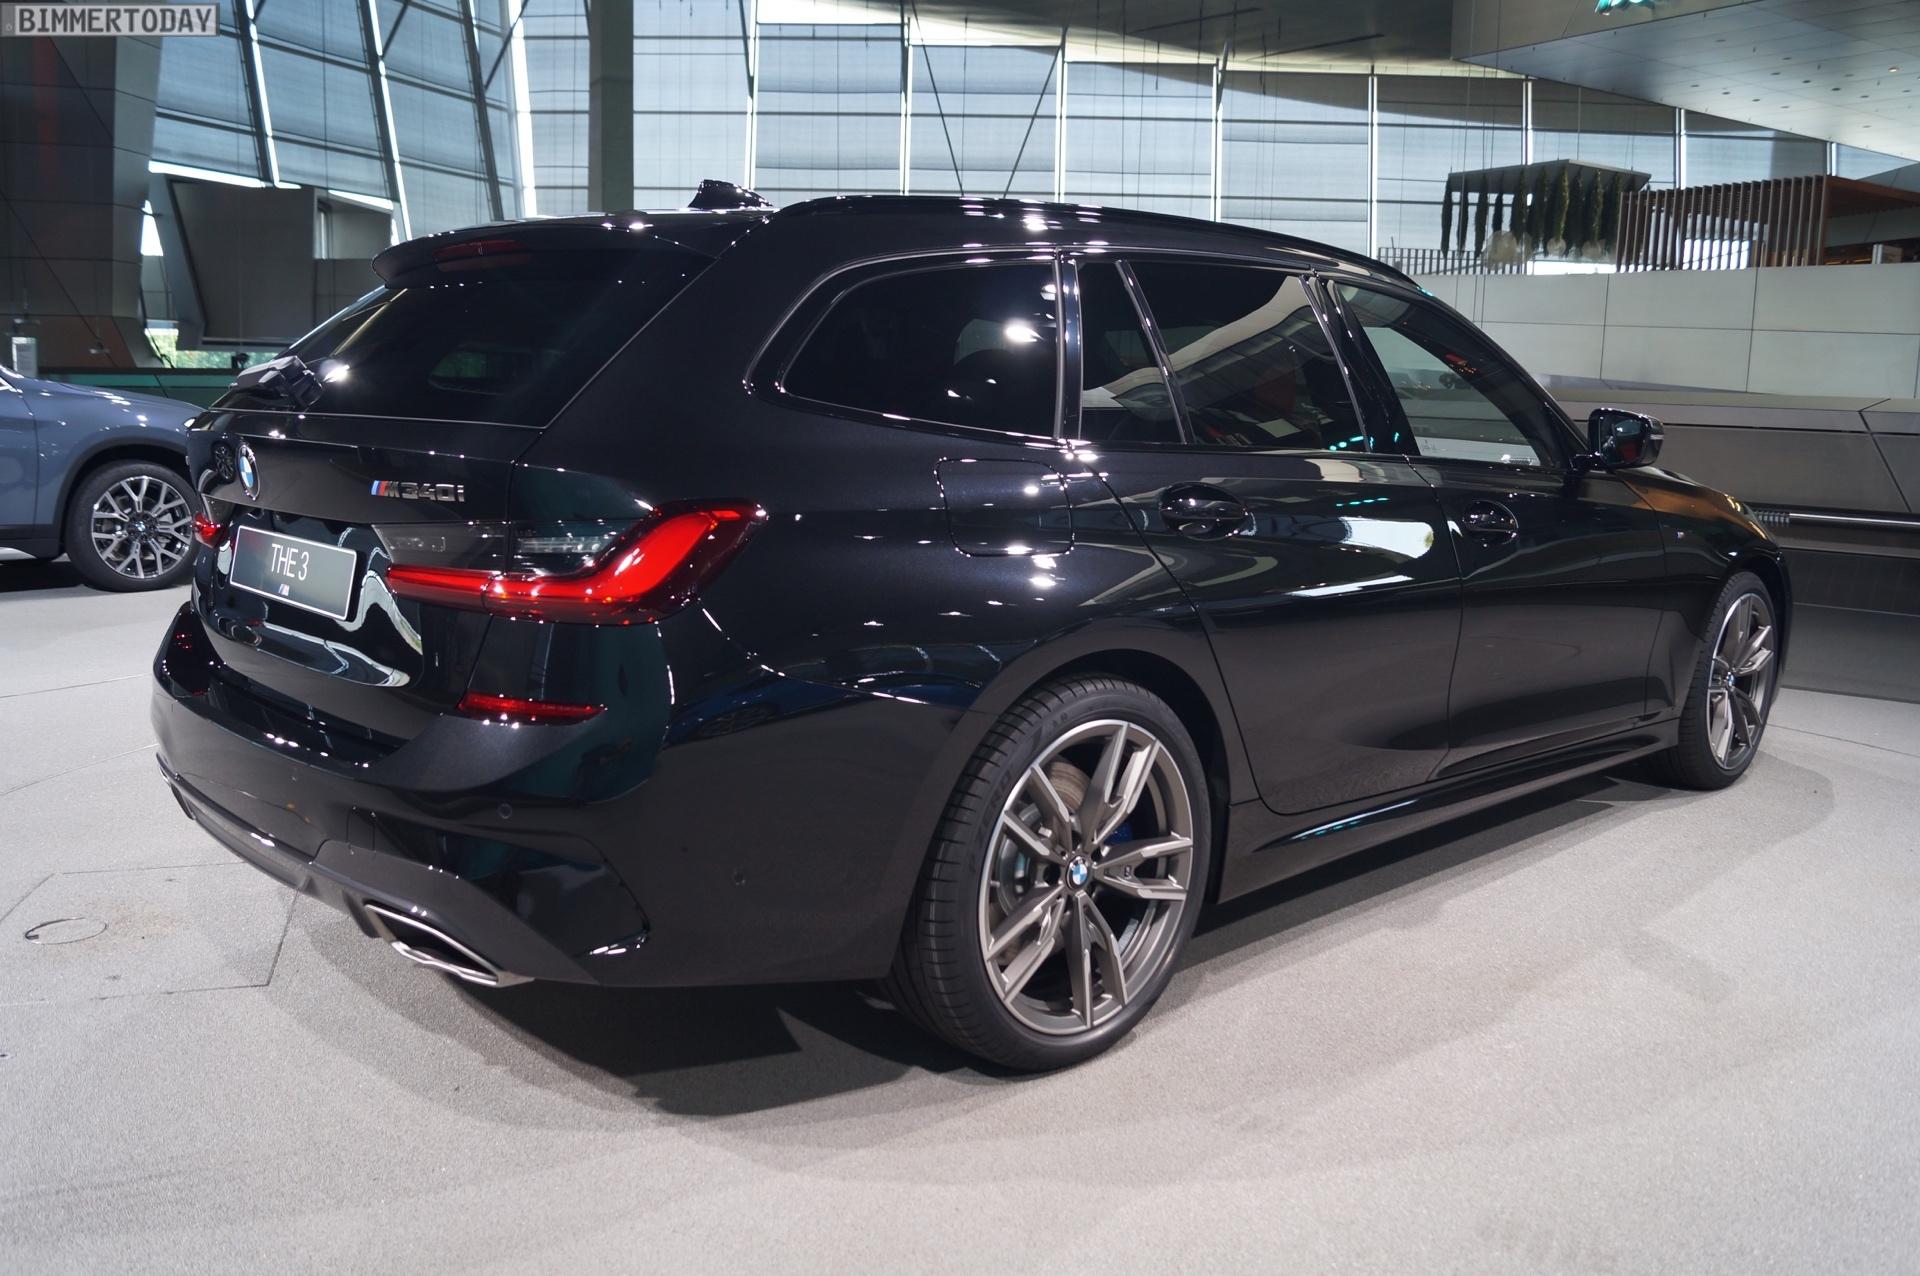 BMW M4 Cs >> #NextGen 2019: Live-Fotos zum BMW 3er Touring G21 als M340i